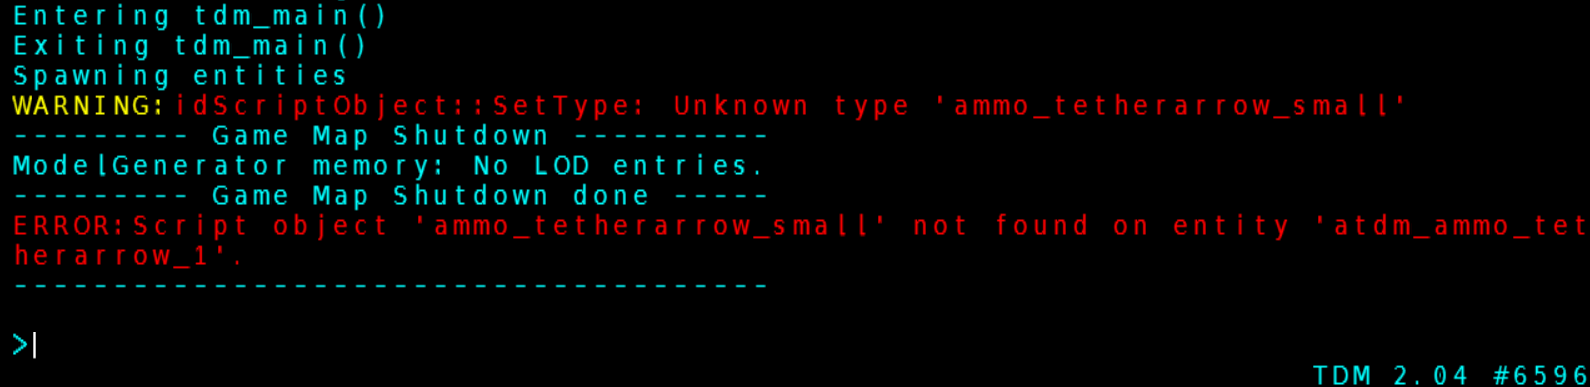 tetherarrowerror.png?ssl=1&w=800